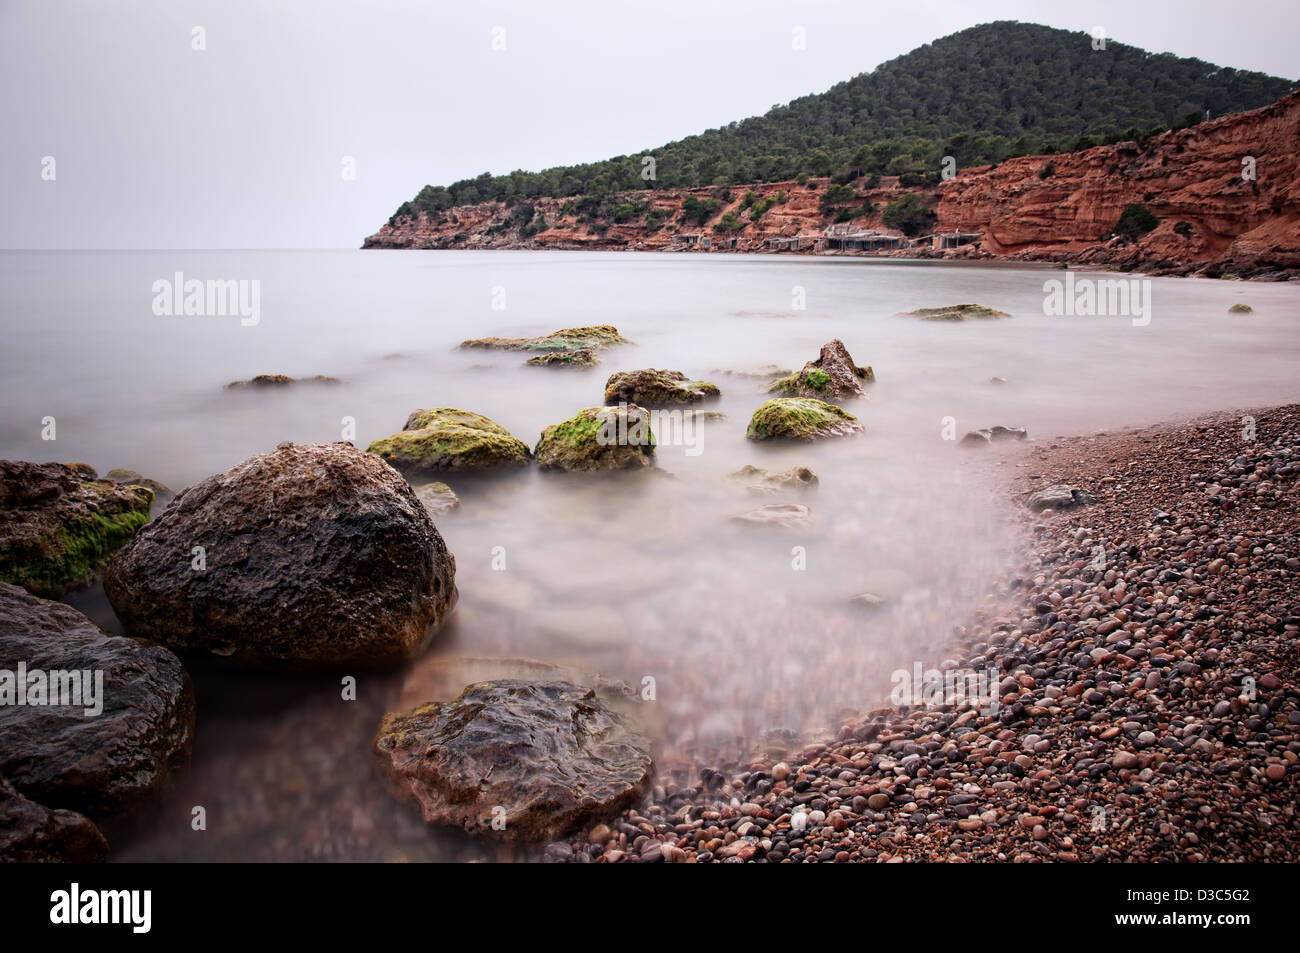 Sa Caleta beach. Ibiza, Balearic Islands, Spain - Stock Image